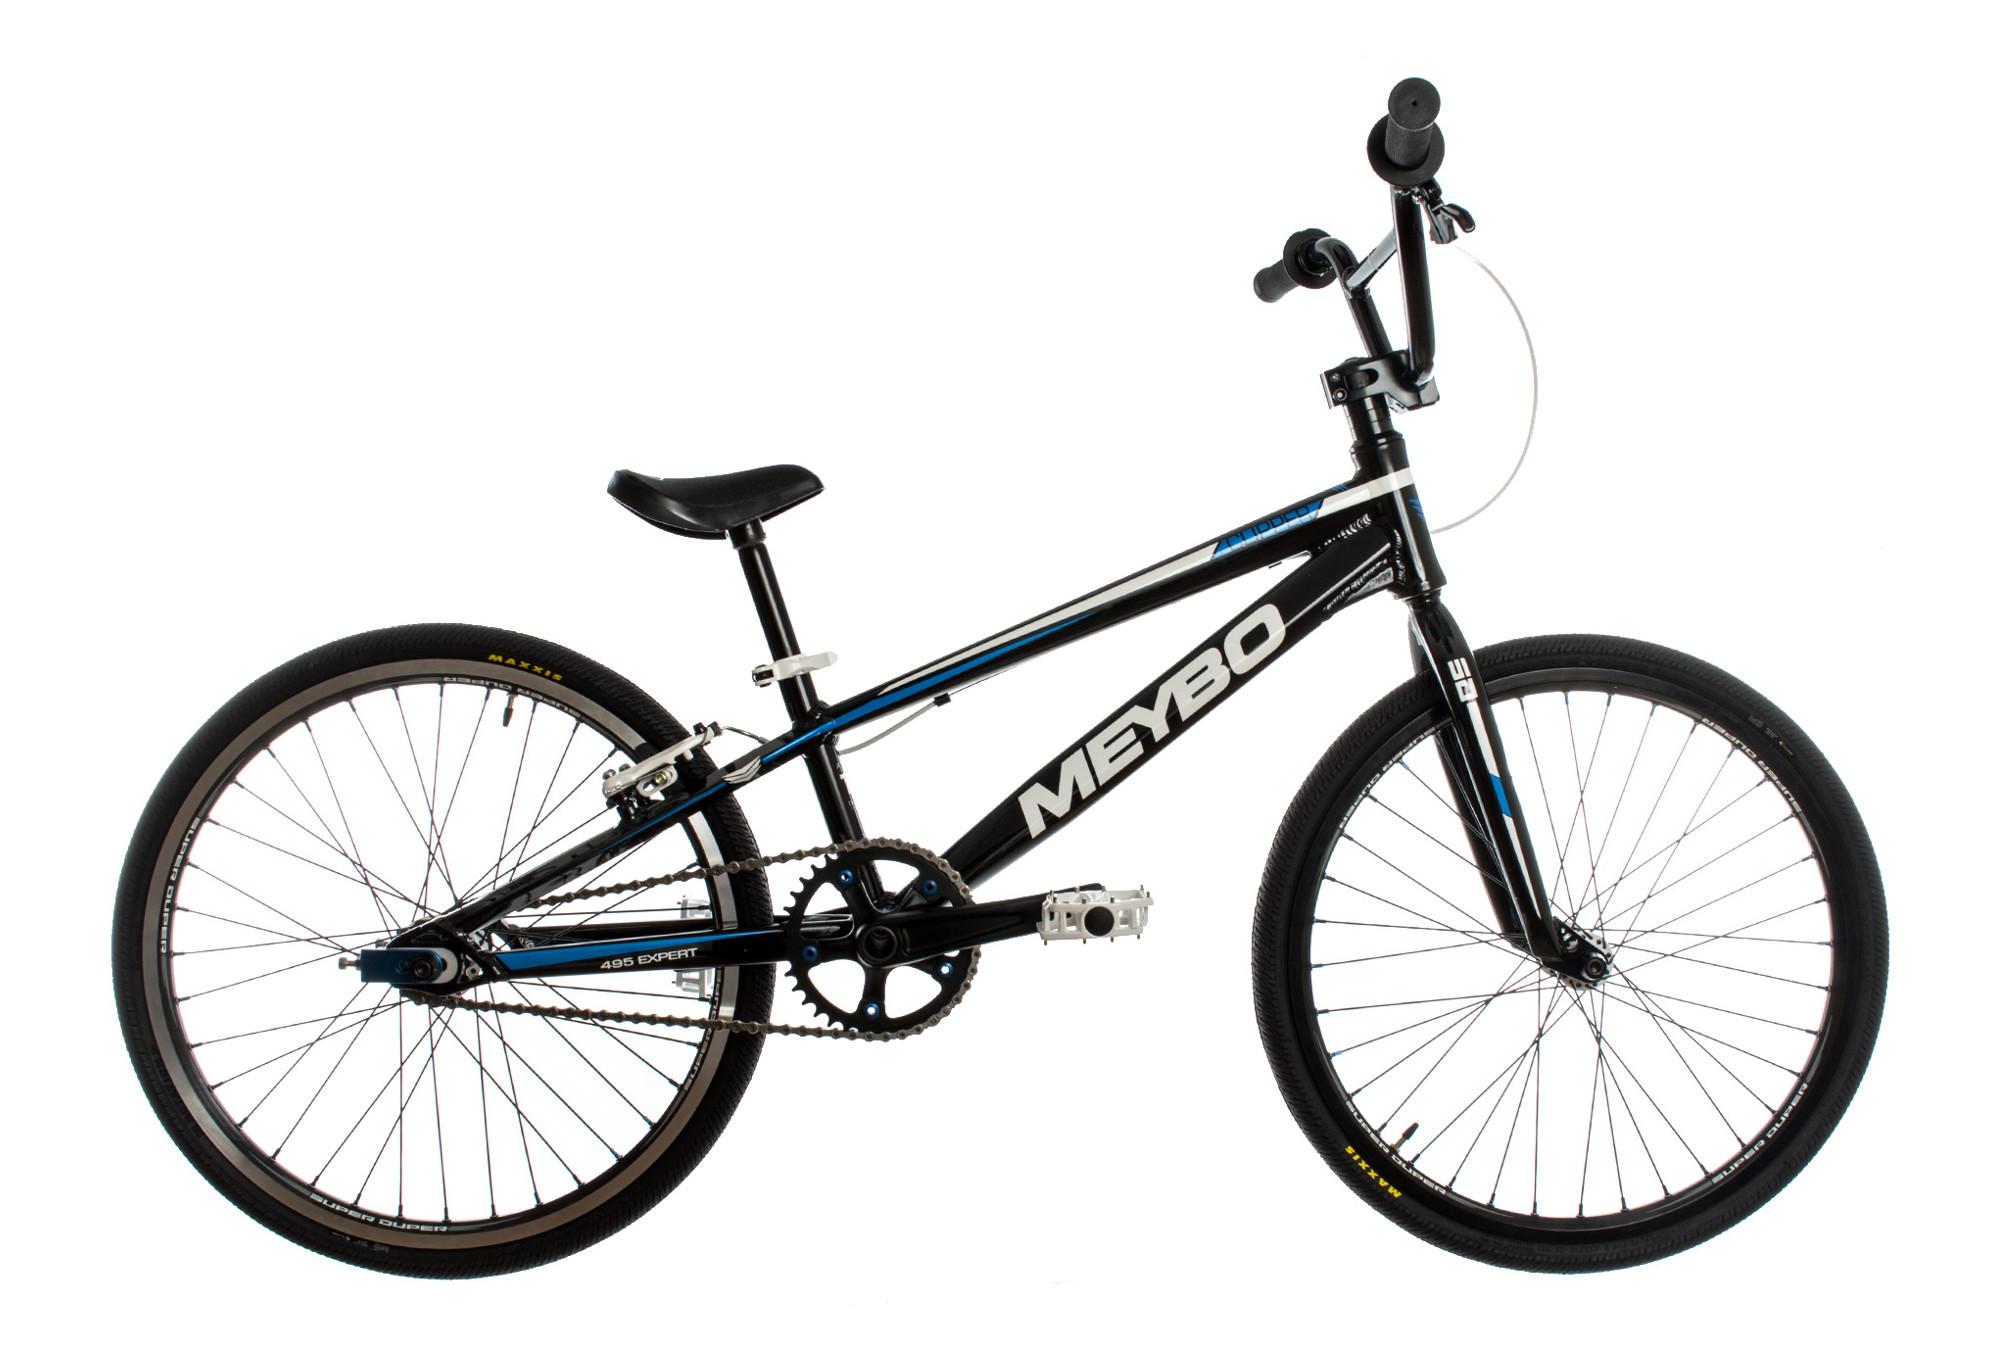 meybo clipper bmx bike expert xl black. Black Bedroom Furniture Sets. Home Design Ideas